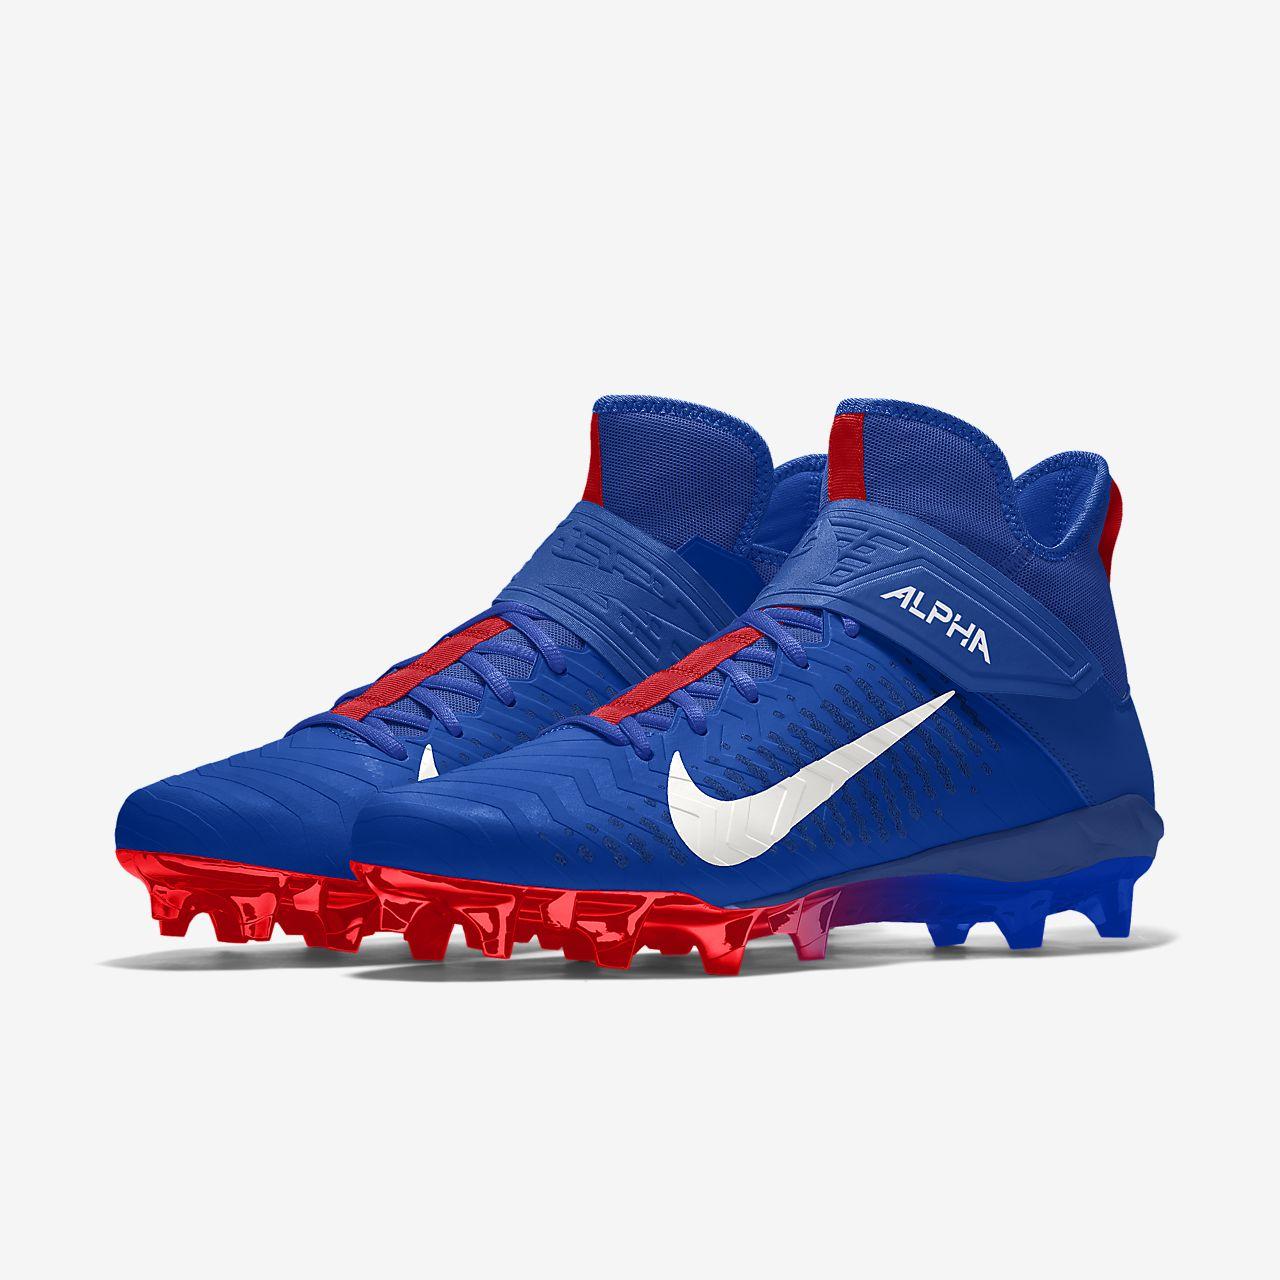 Chaussure de football à crampons personnalisable Nike Alpha Menace Pro 2 Mid By You pour Homme